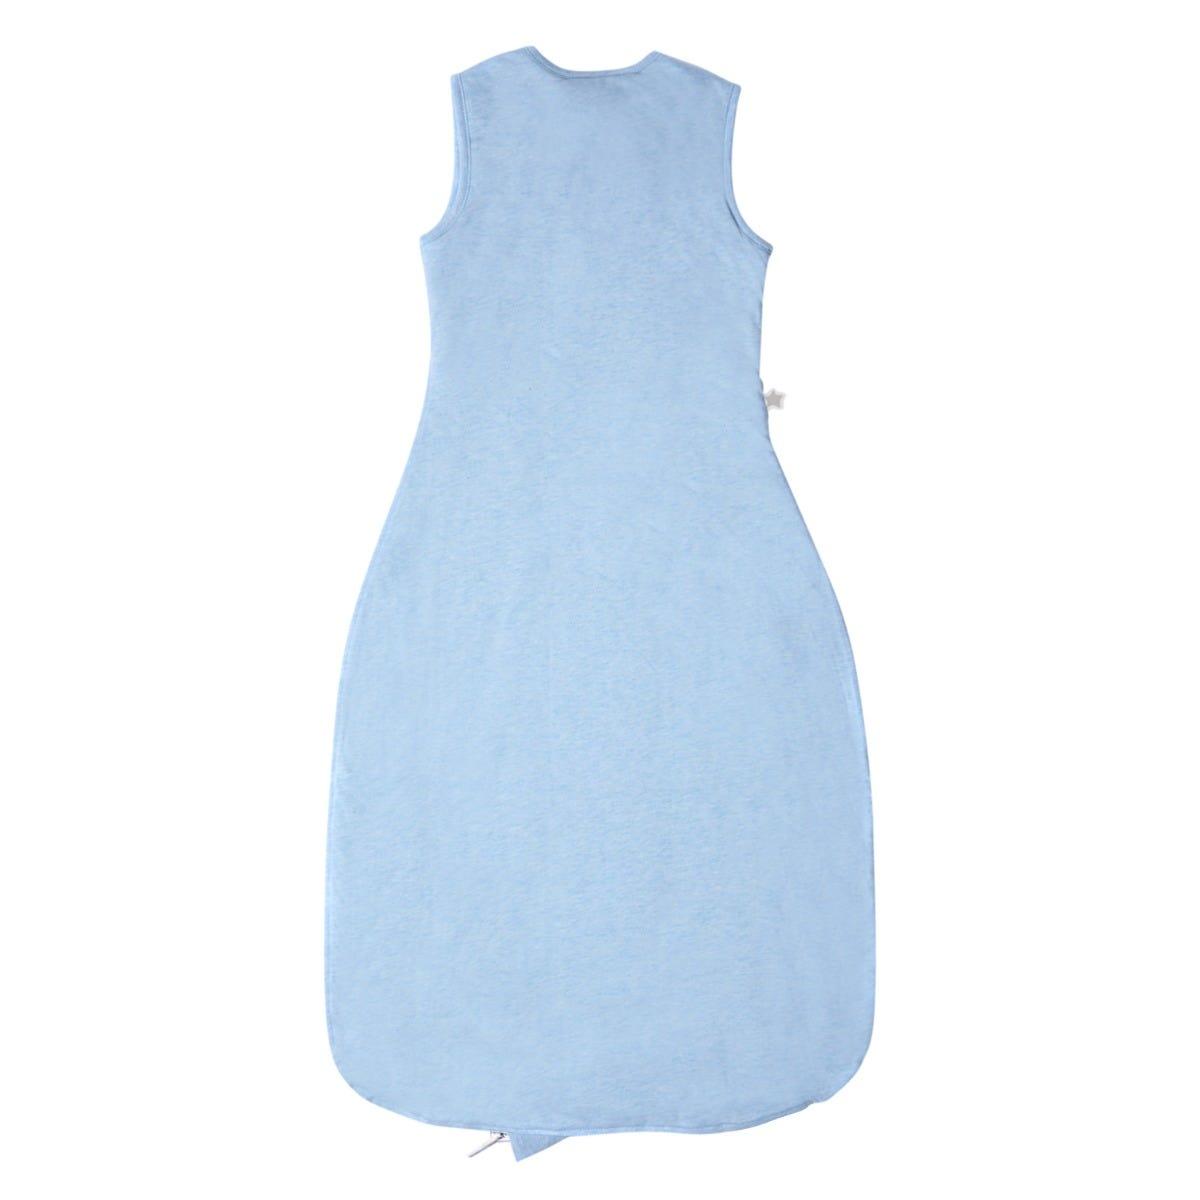 The Original Grobag Blue Marl Sleepbag back